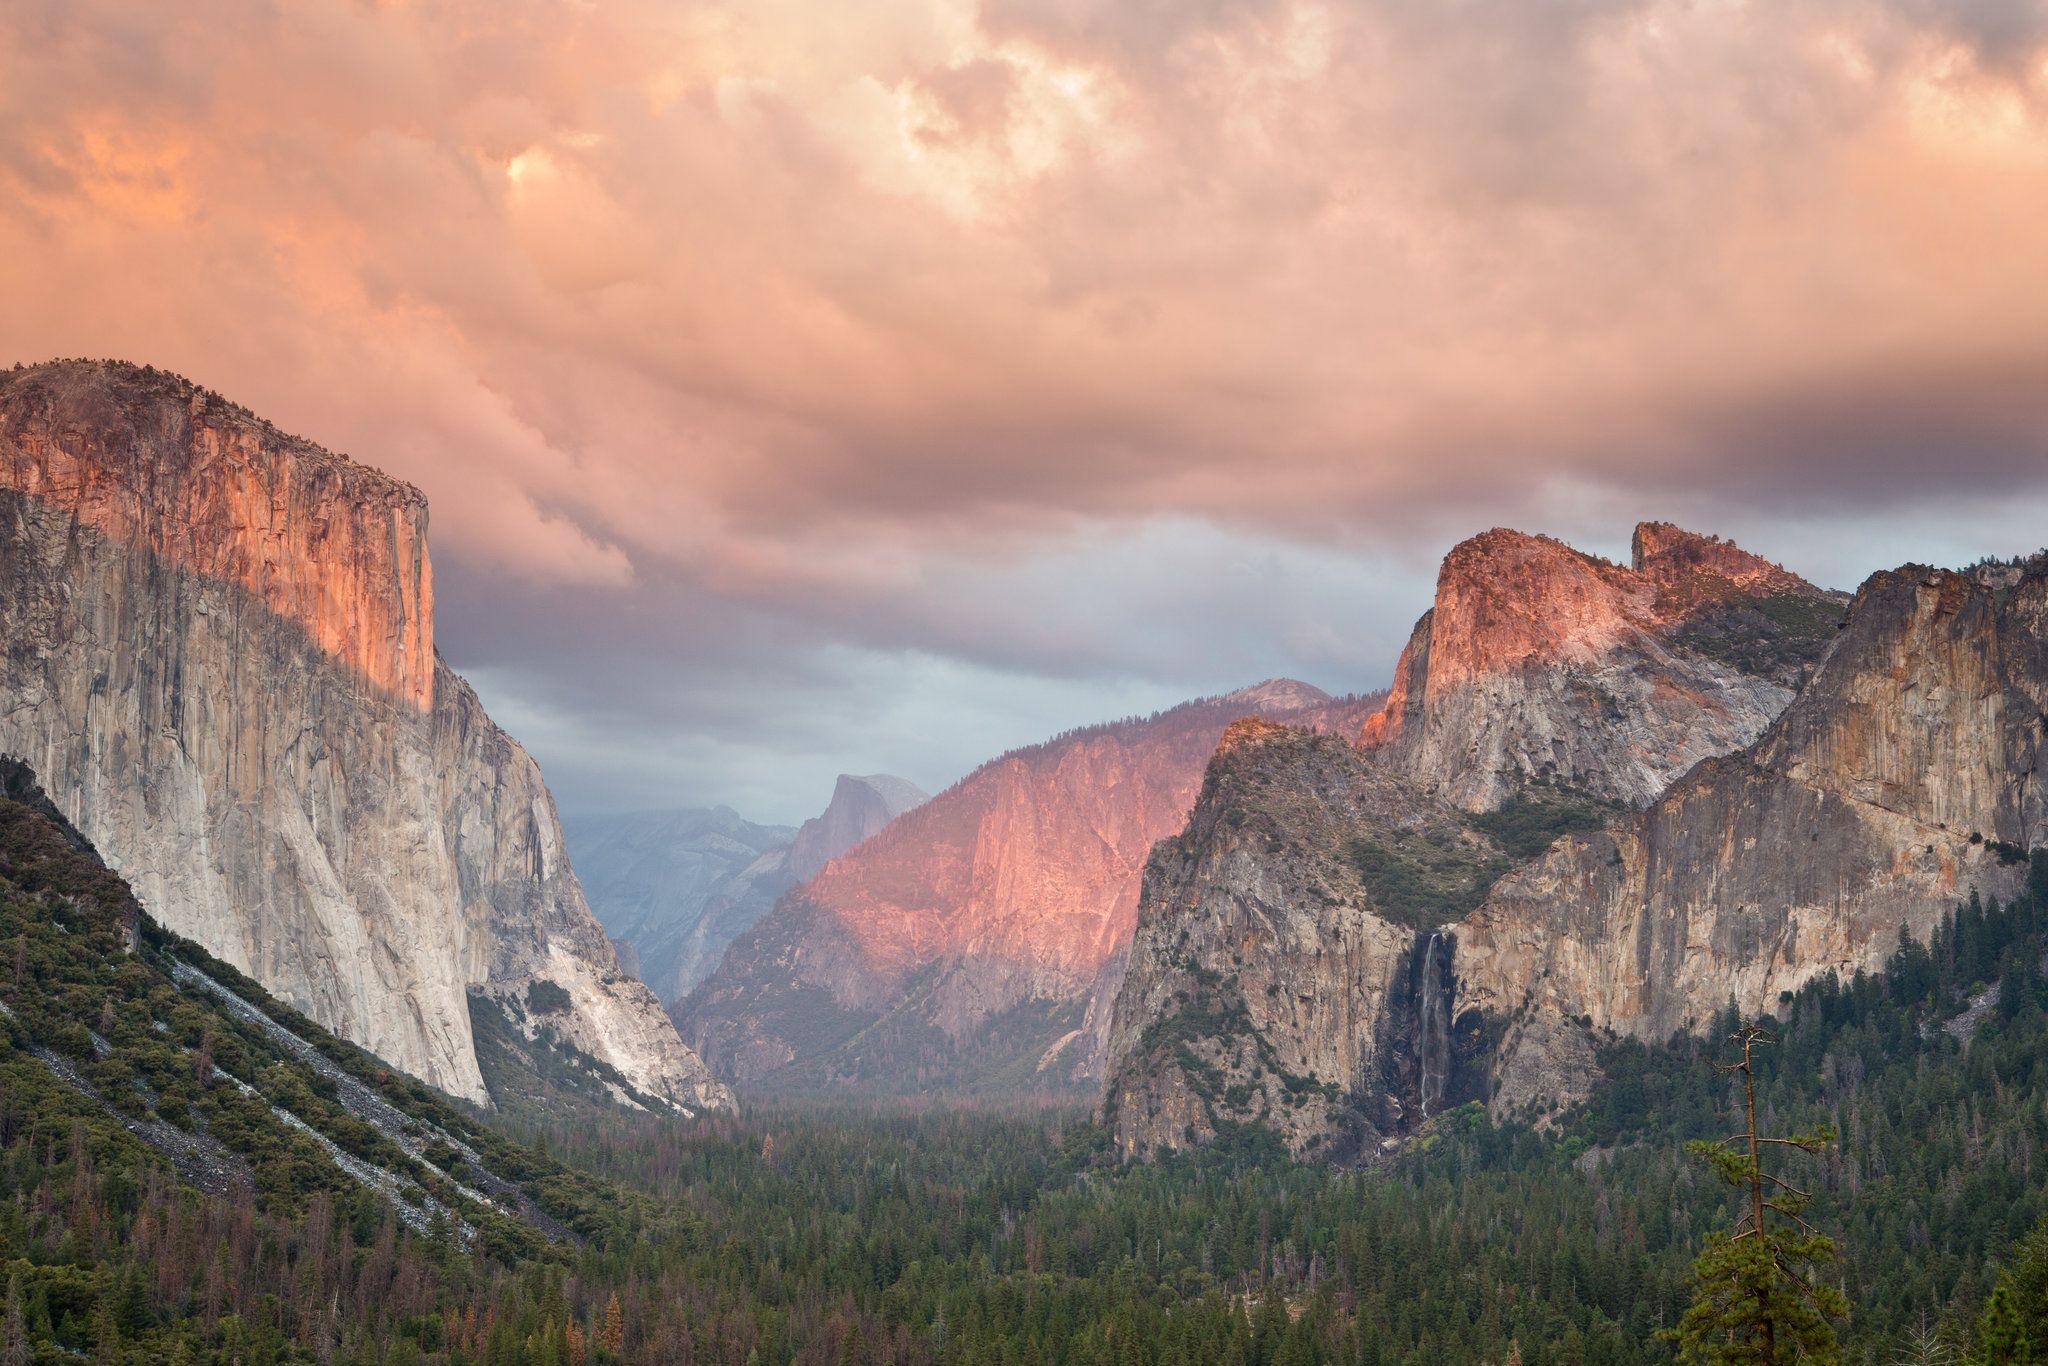 Summer Camping Yosemite Wallpapers - Wallpaper Cave